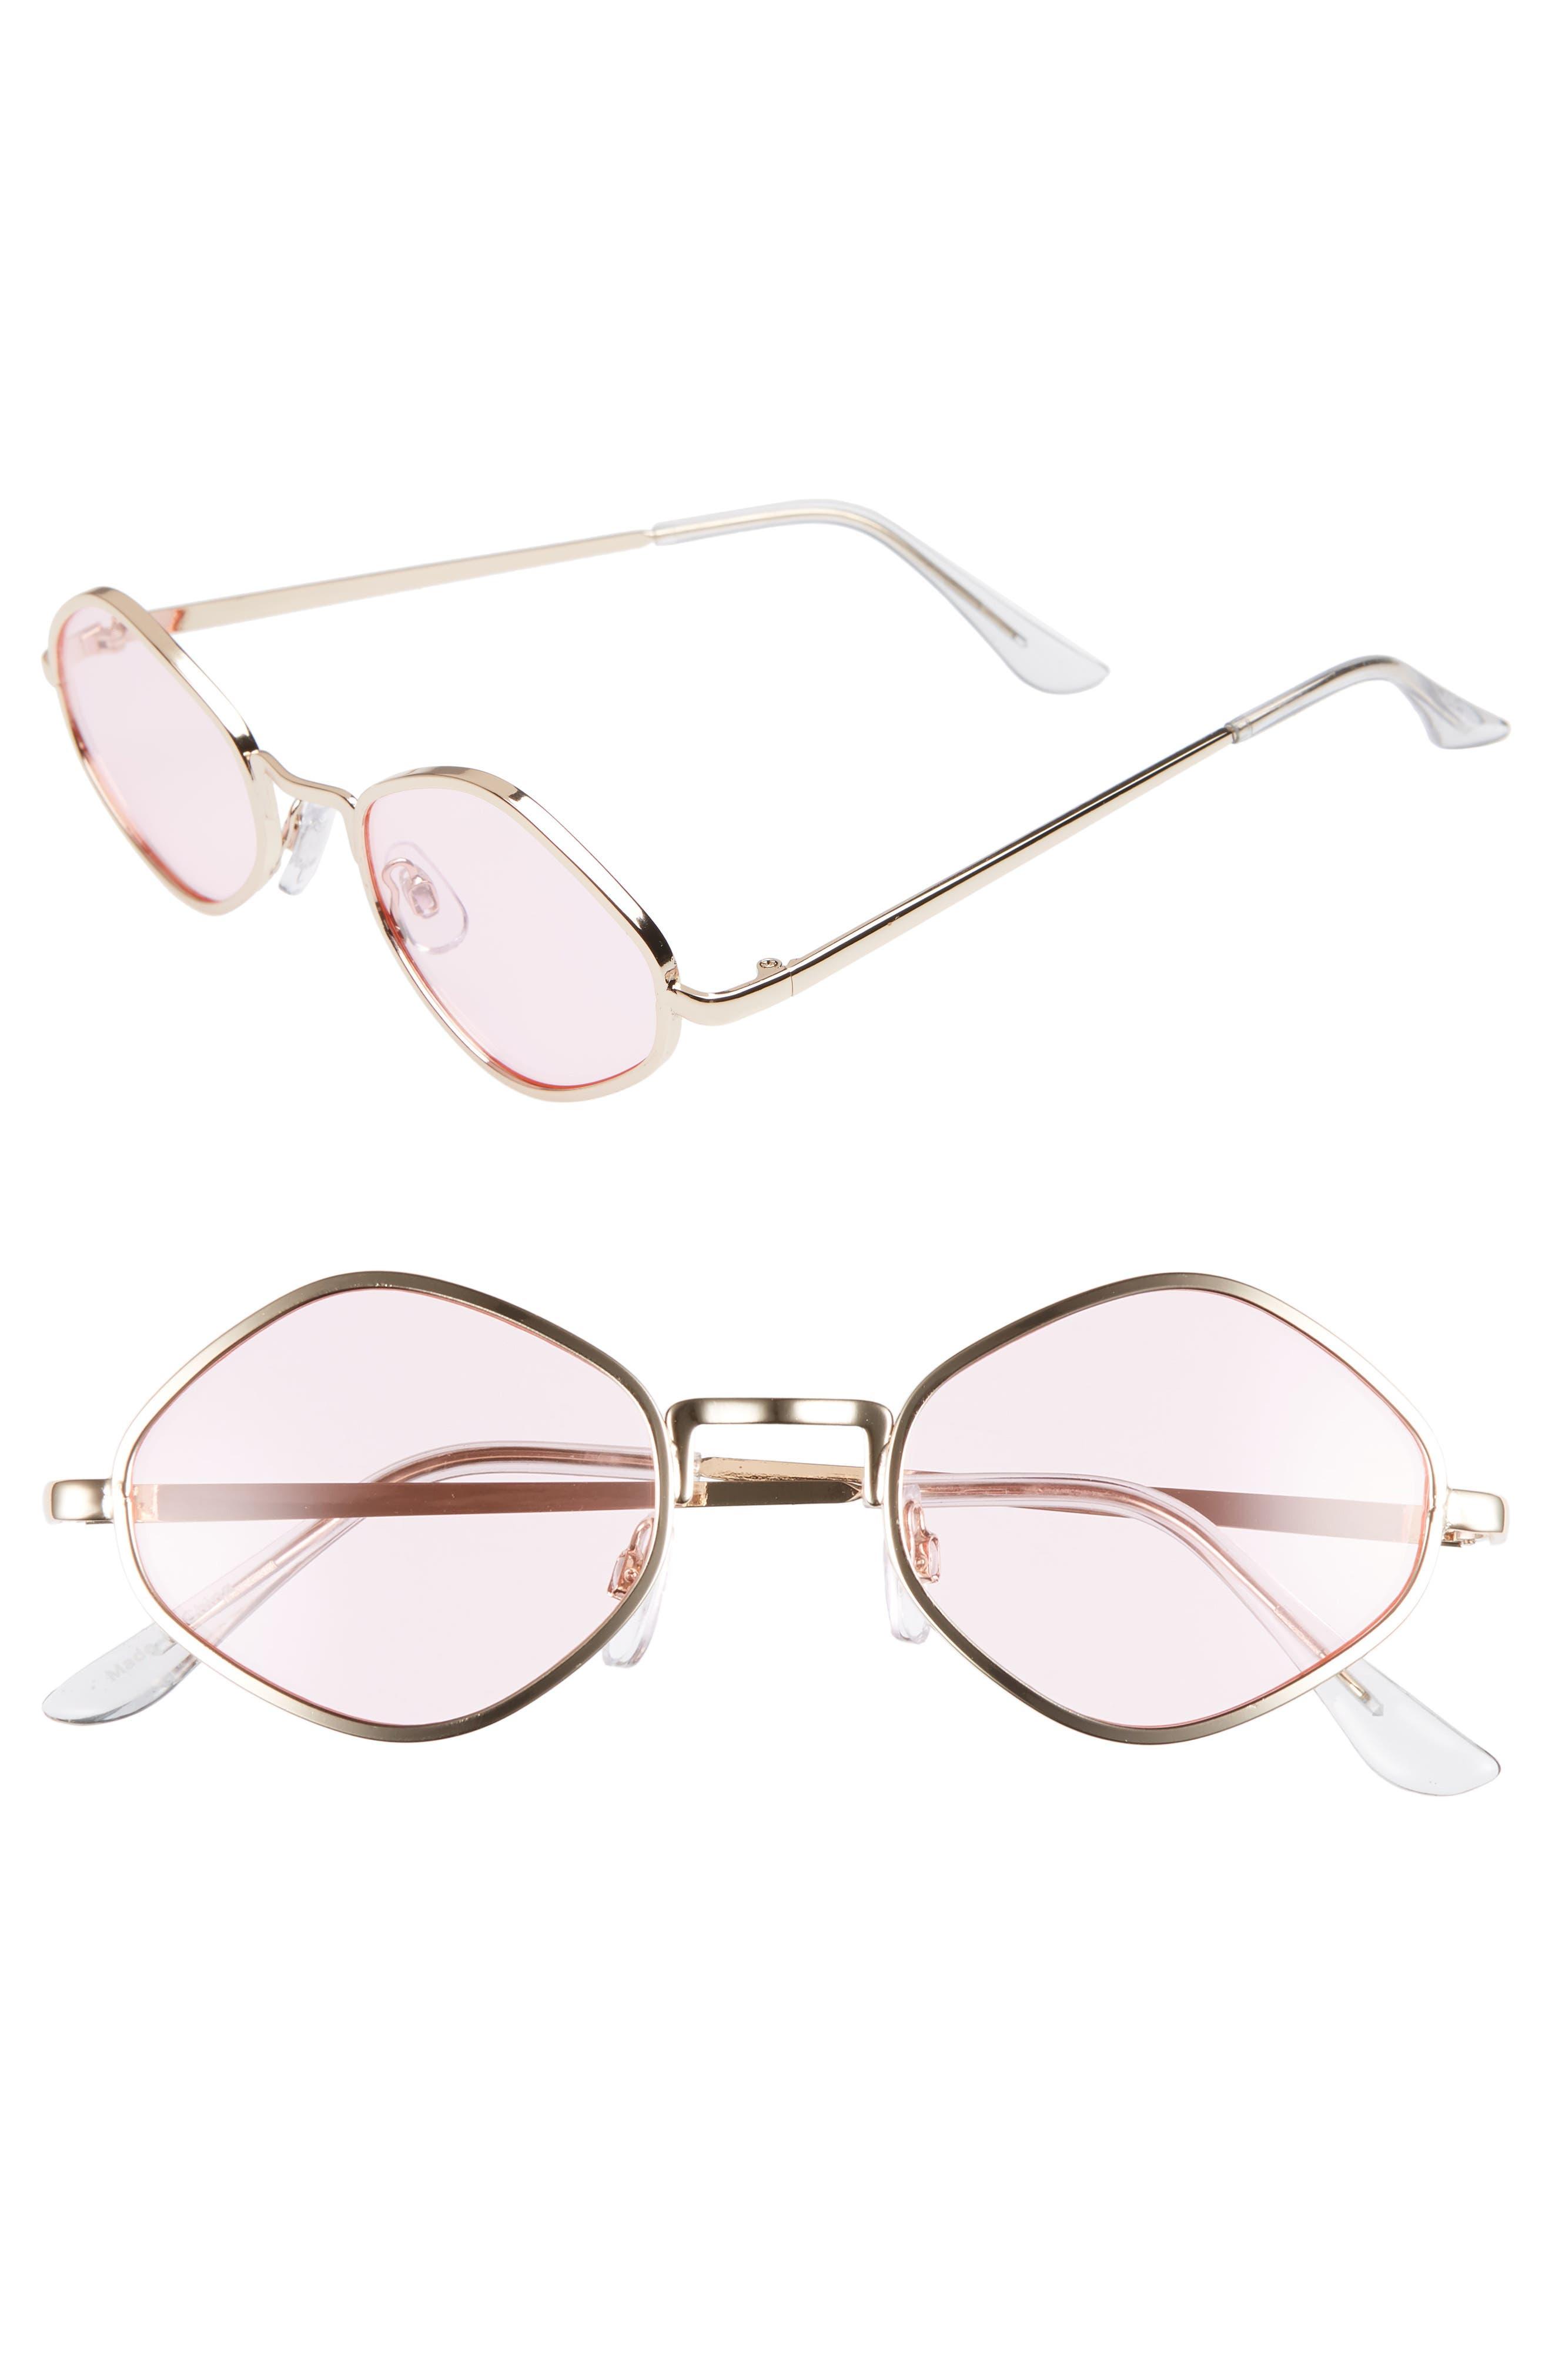 2db190a5775216 Bp. 4m Small Geo Sunglasses - Gold Pink